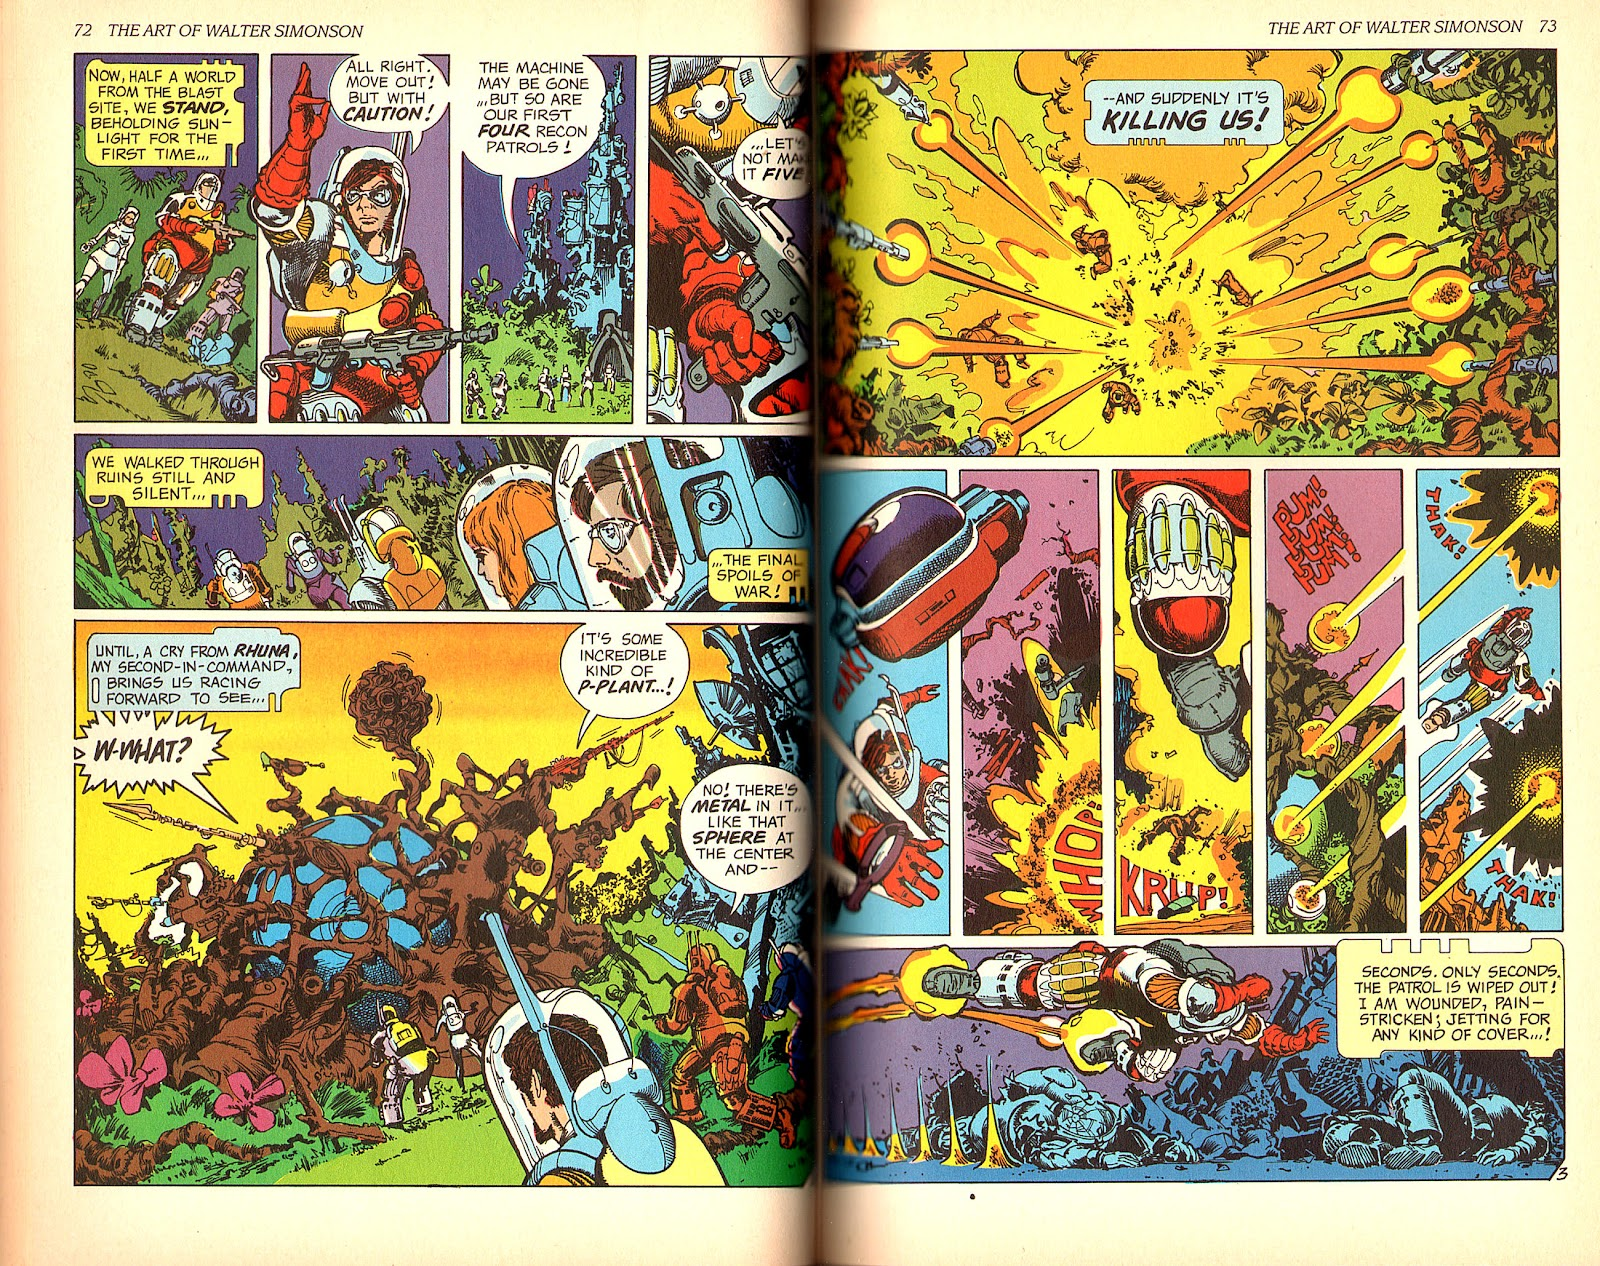 Read online The Art of Walter Simonson comic -  Issue # TPB - 38